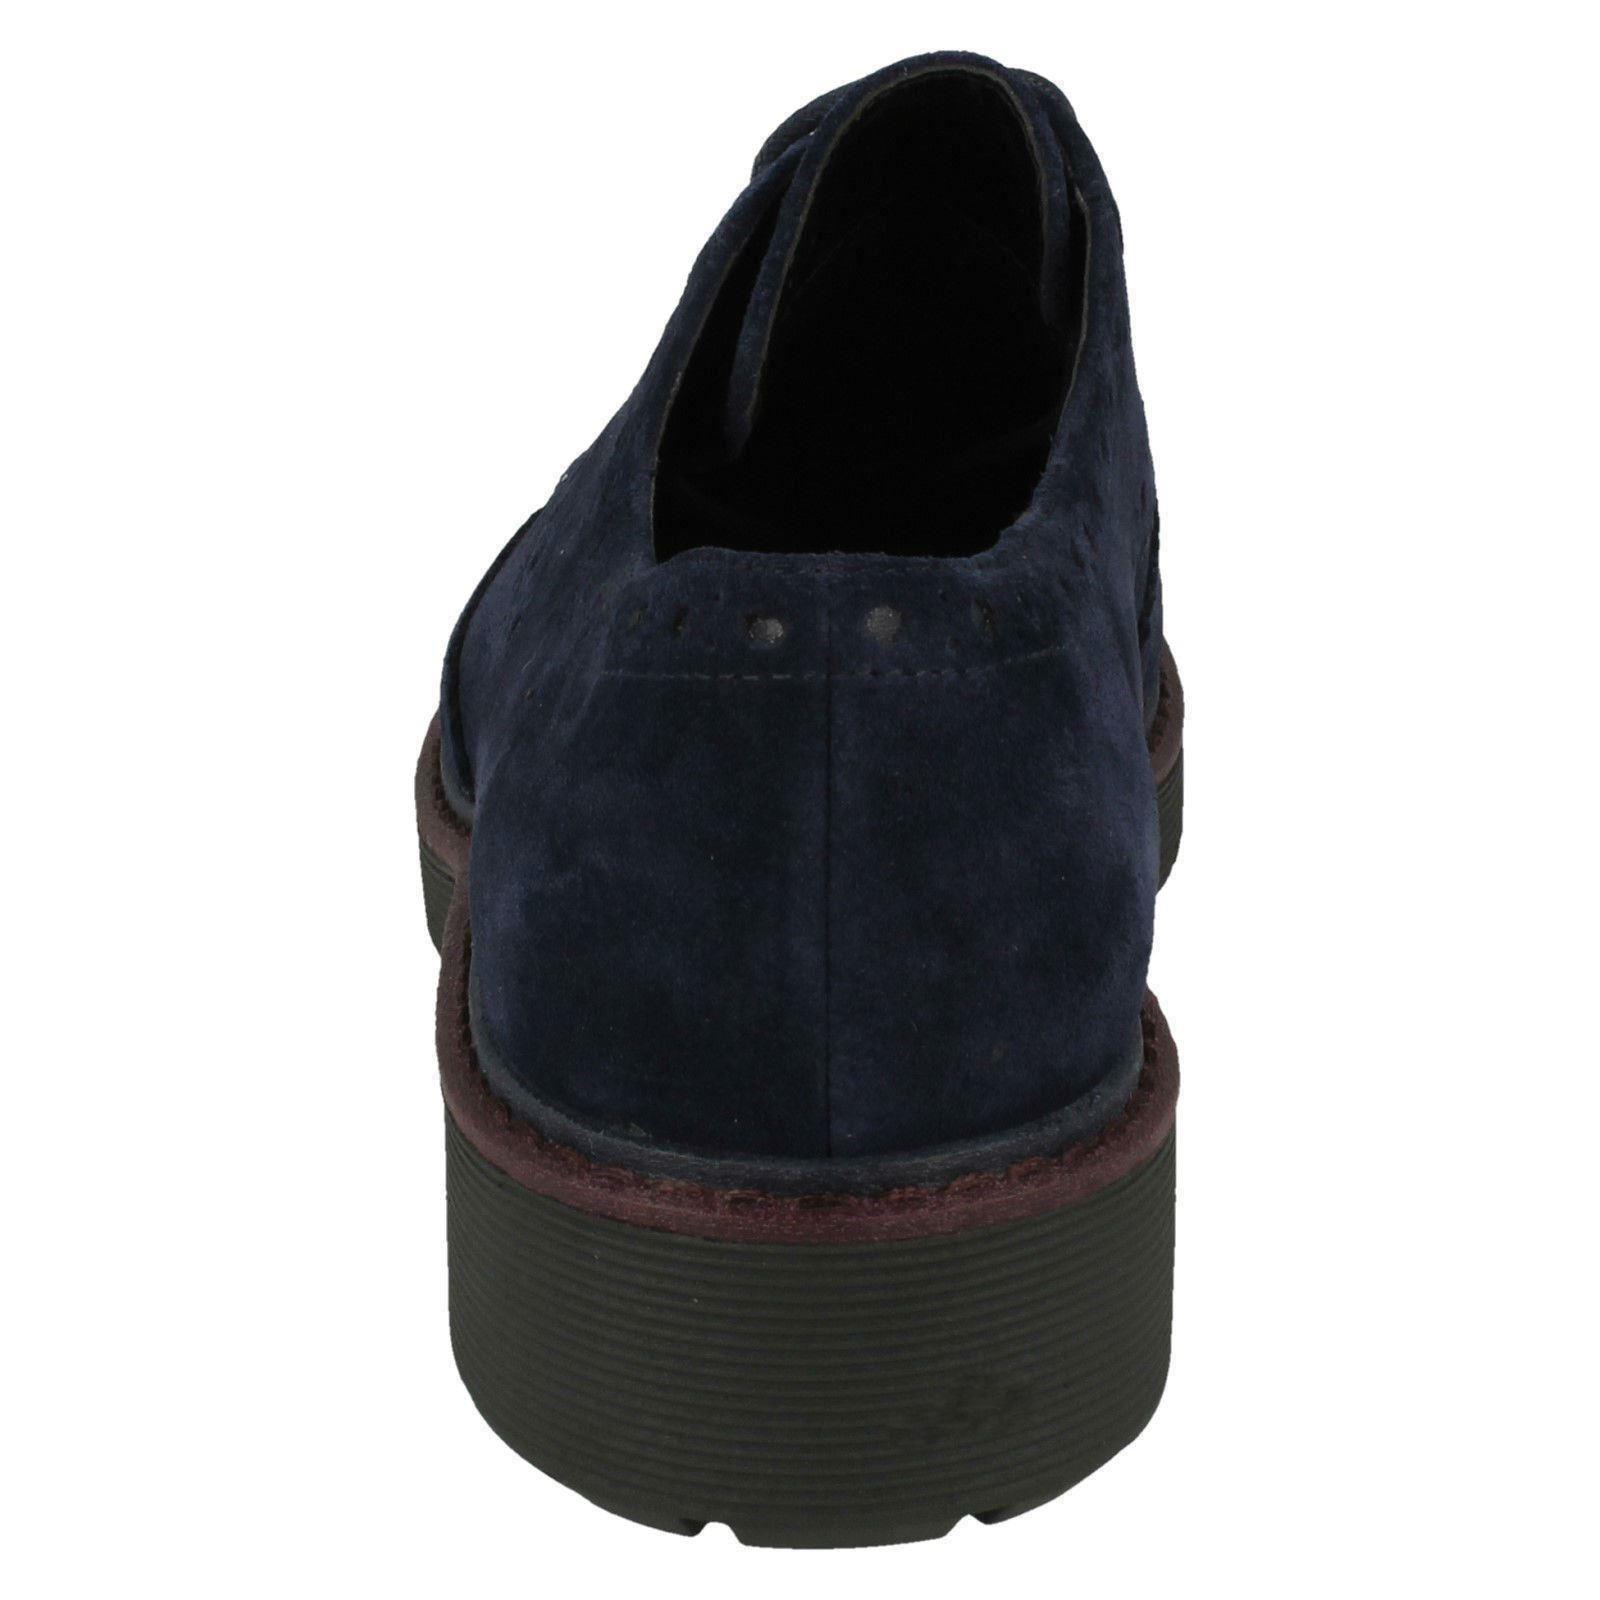 Ladies Clarks Lace Up Casual shoes - Alexa Alexa Alexa Darcy c87db2